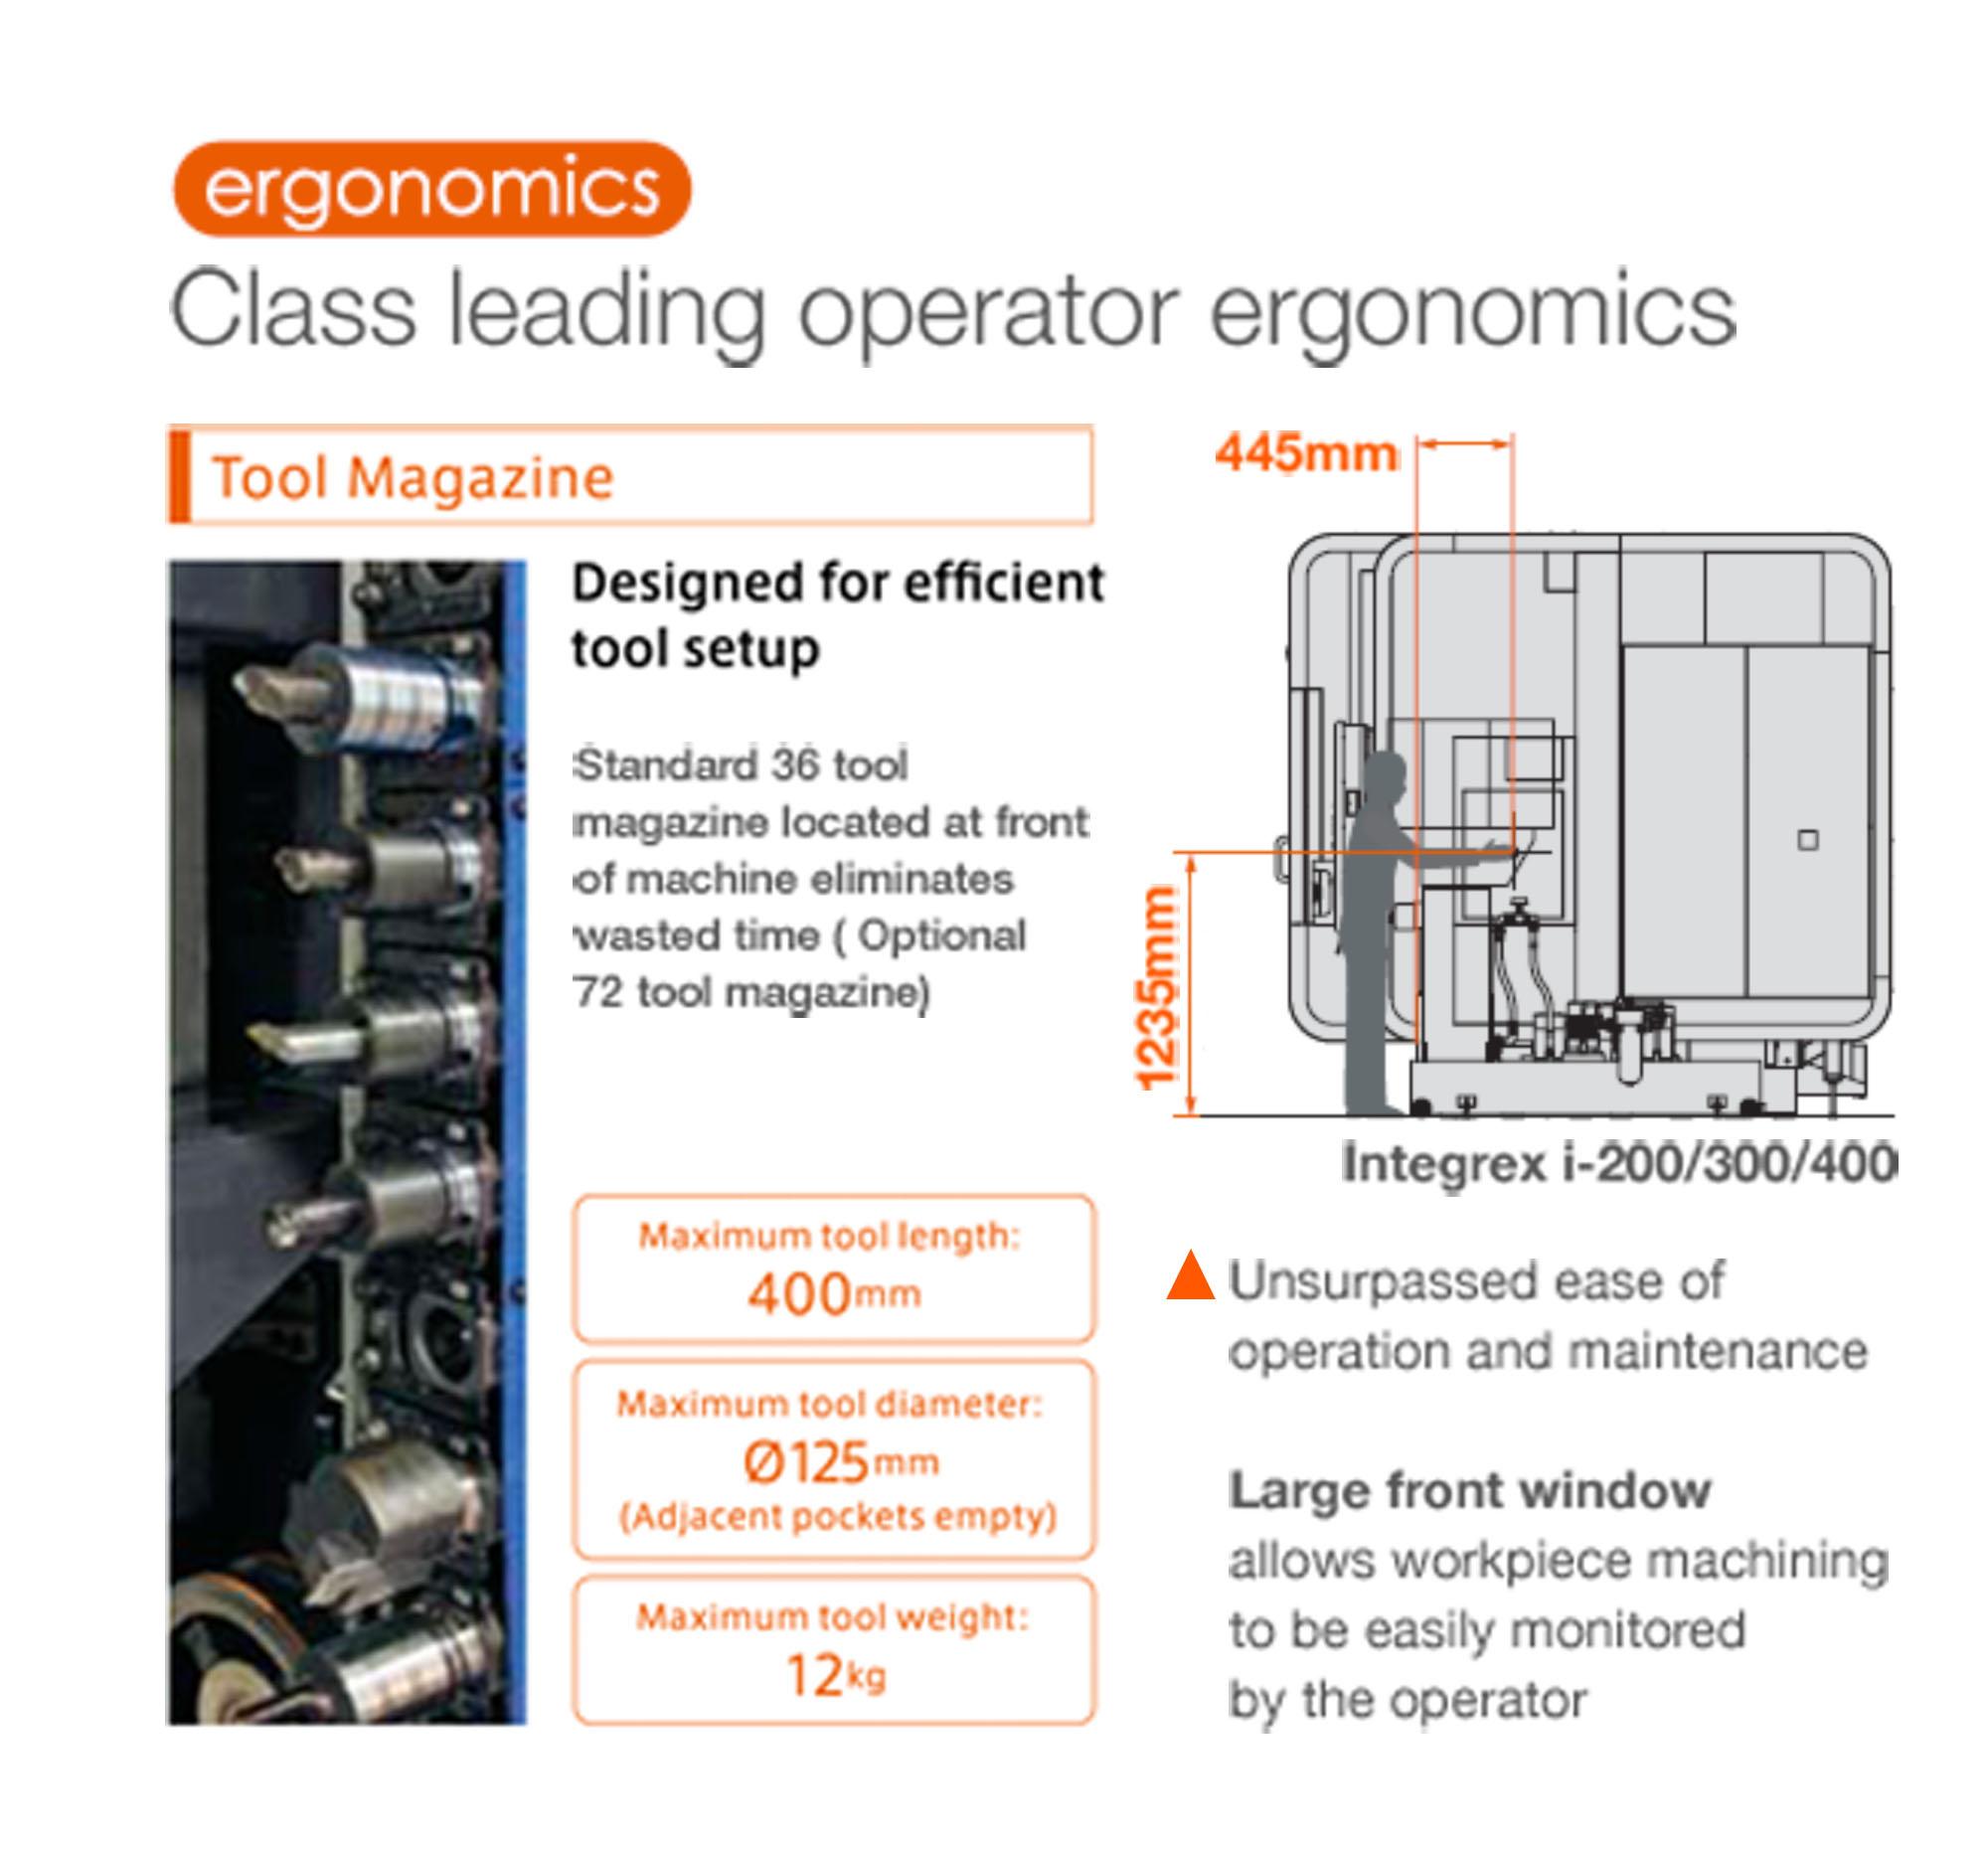 operator ergonomics